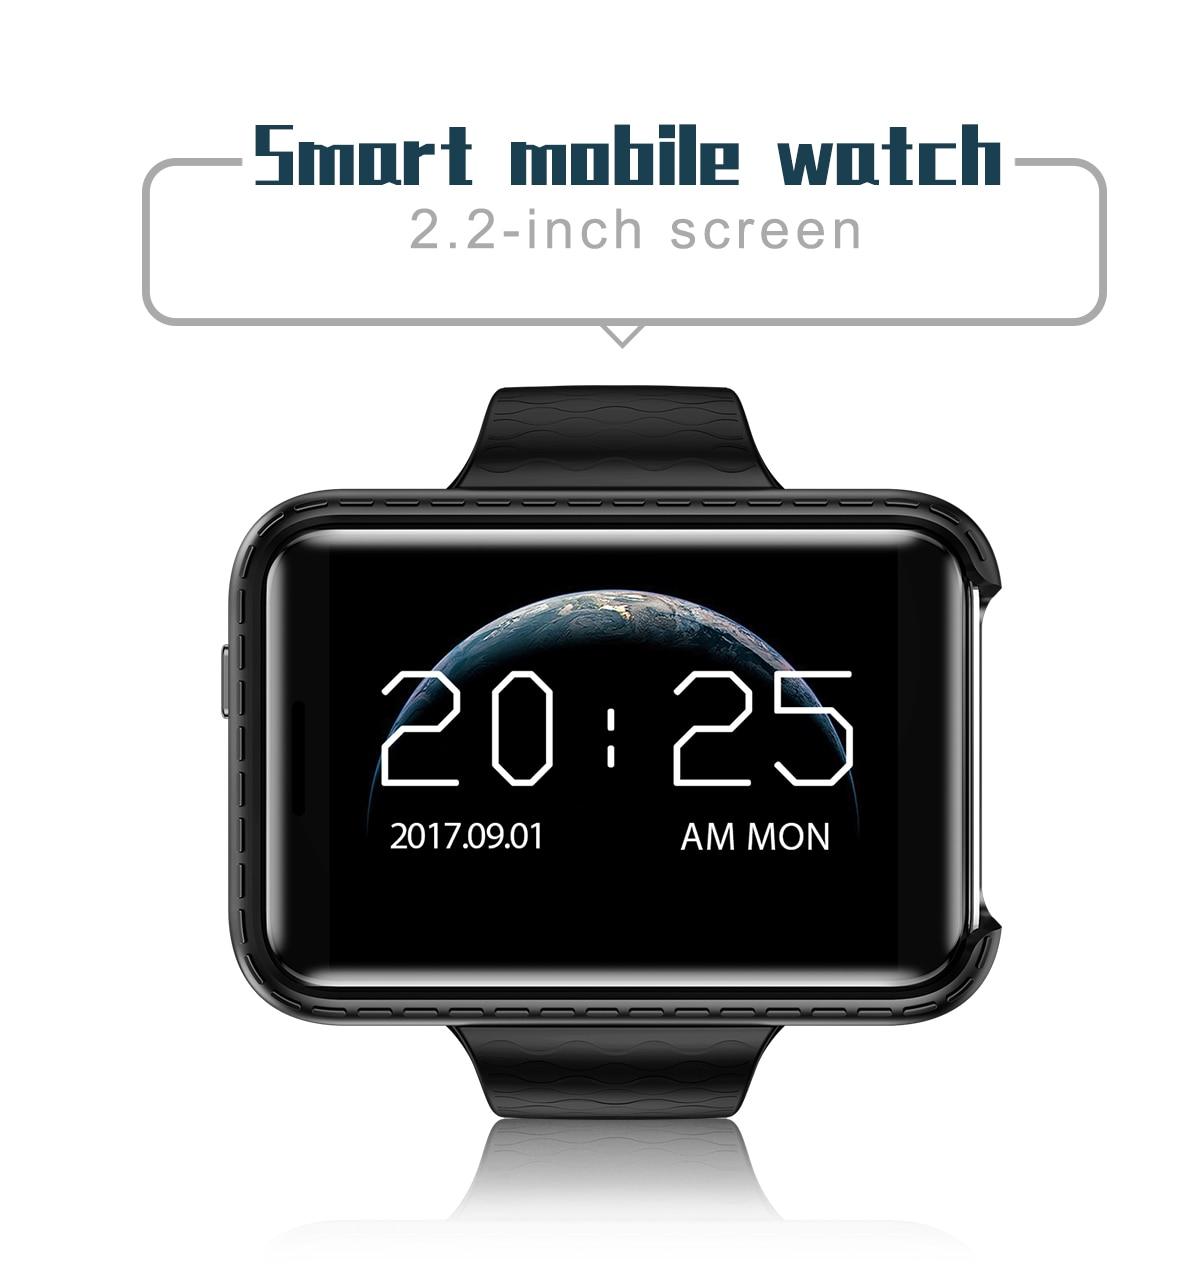 Sport Fitness Pedometer Camera Clock SIM Card GSM Bluetooth Smart Watch 2.2 inch Screen Mobile Cell Phone Wristwatch pk AN1 DM98